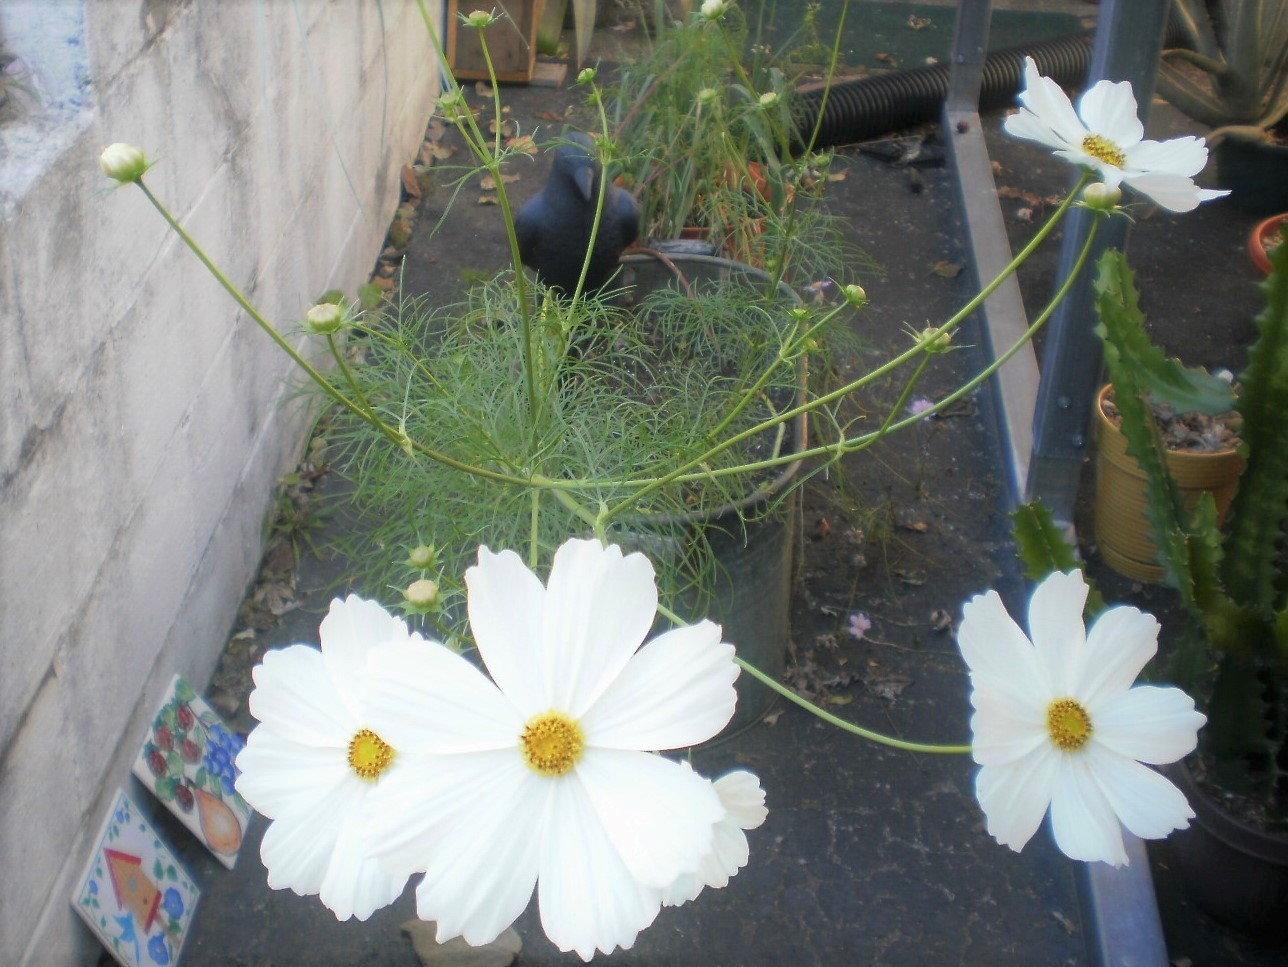 white cosmos blossoms